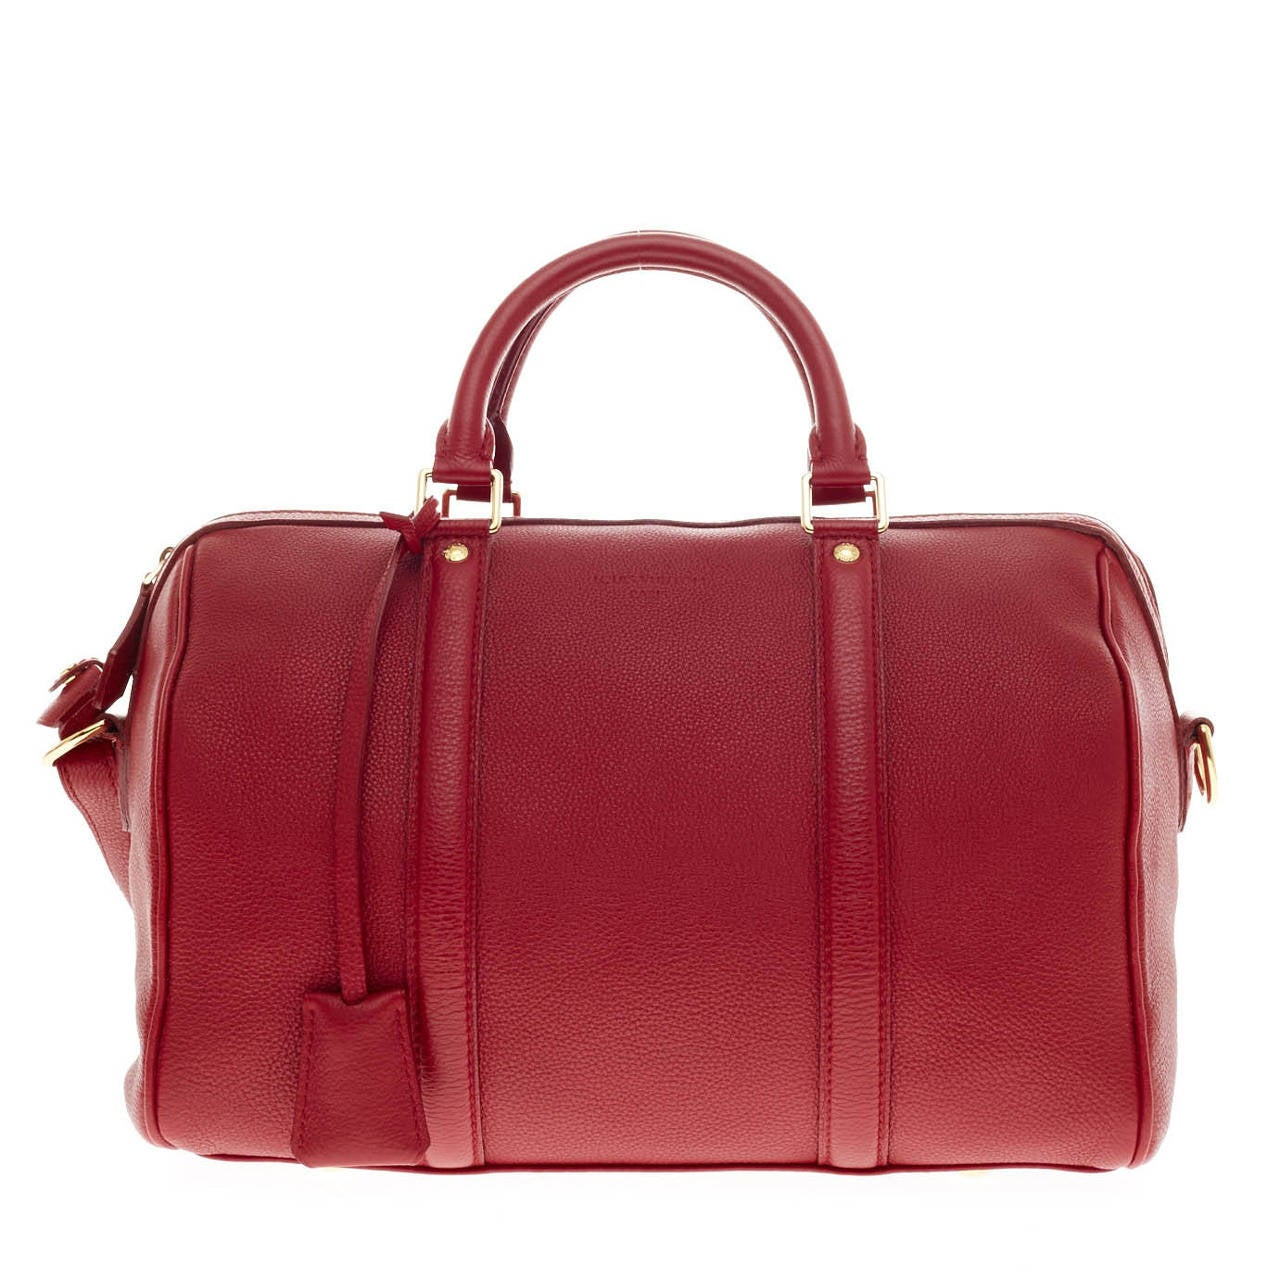 Louis Vuitton Sofia Coppola SC Bag Calfskin Leather PM at ...